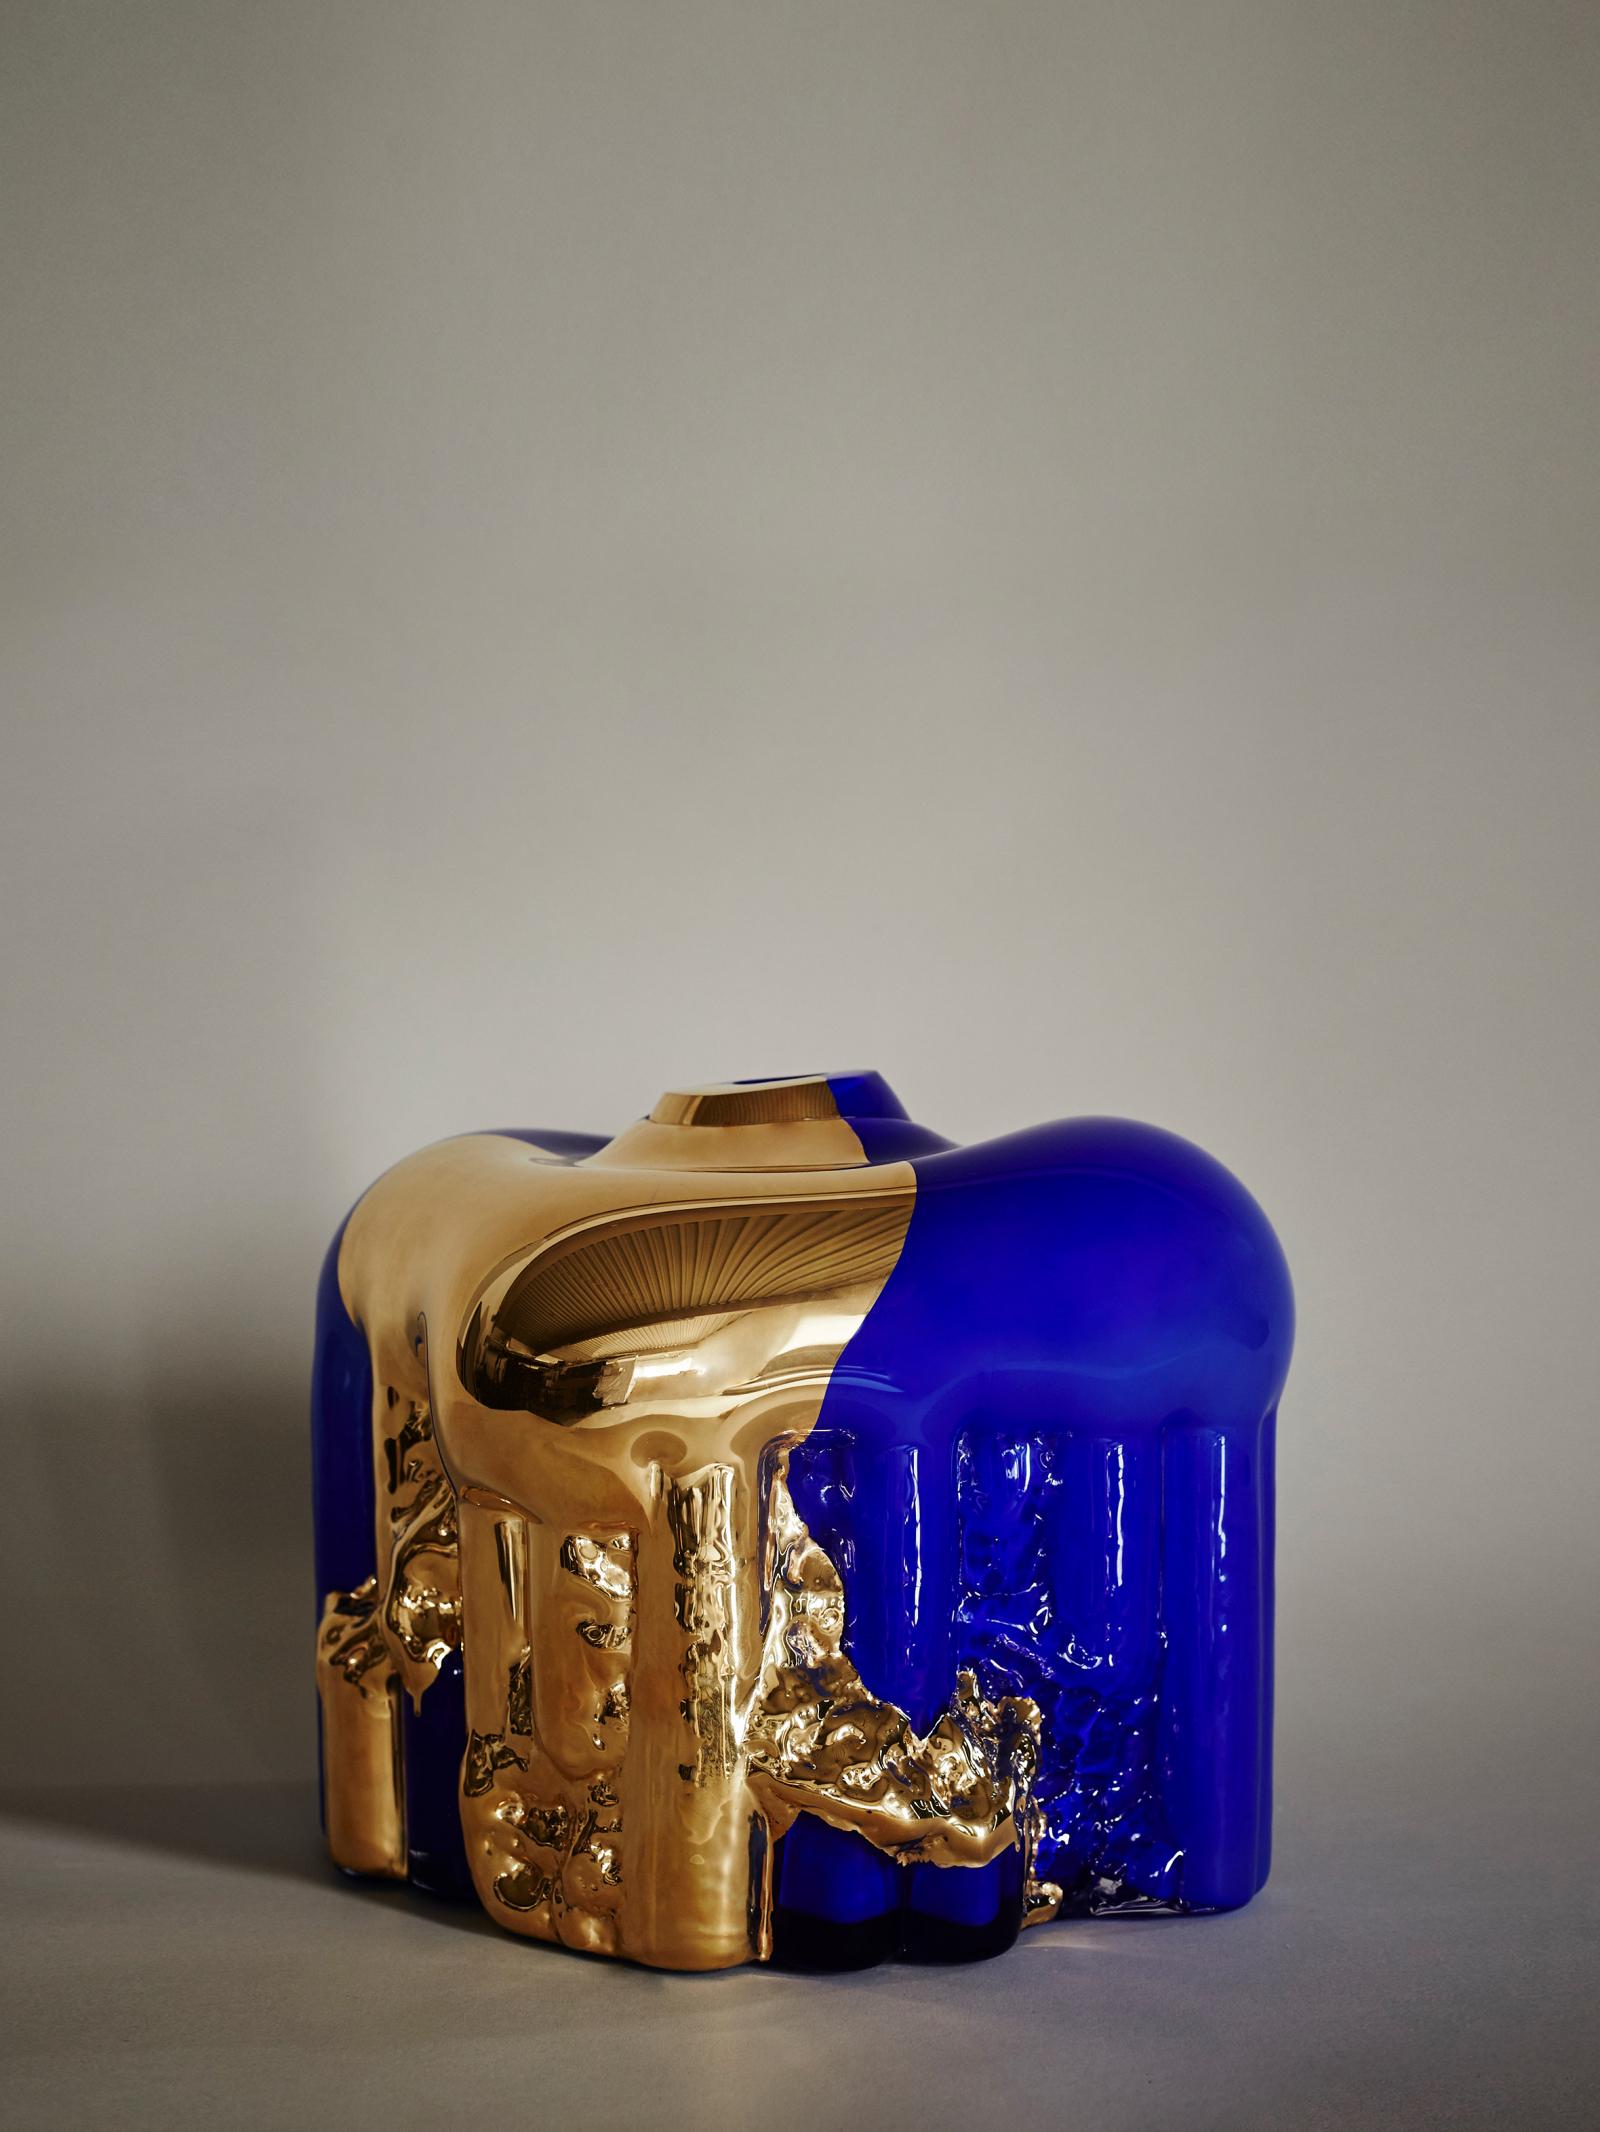 Golden Rain - Blue - Hanna Hansdotter 20 000 SEK